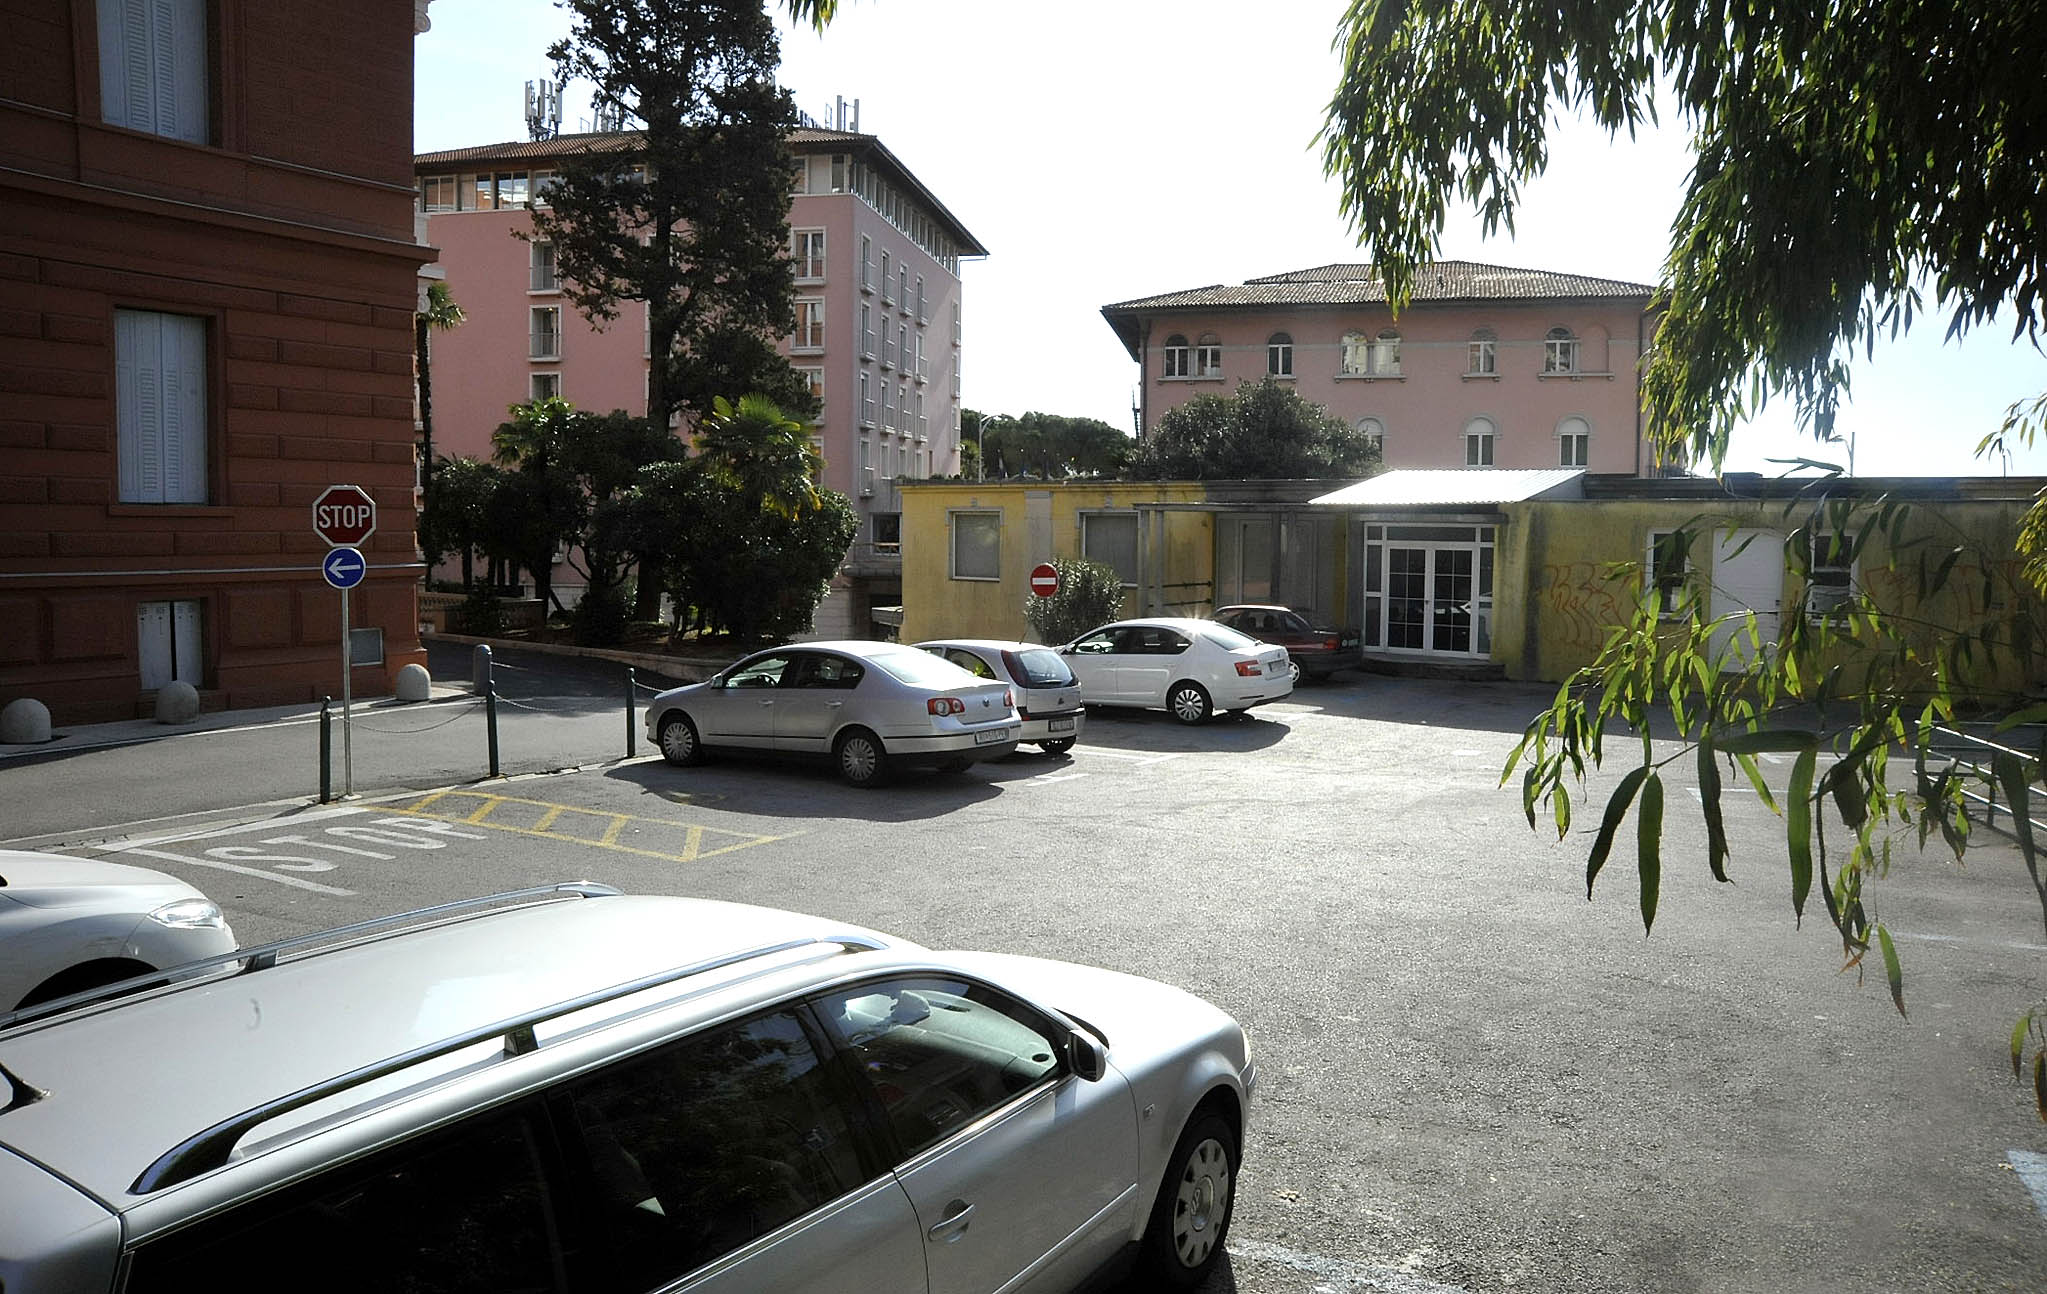 Parking, parkiranje, Opatija, Opatija 21, snimio Sergej DRECHSLER